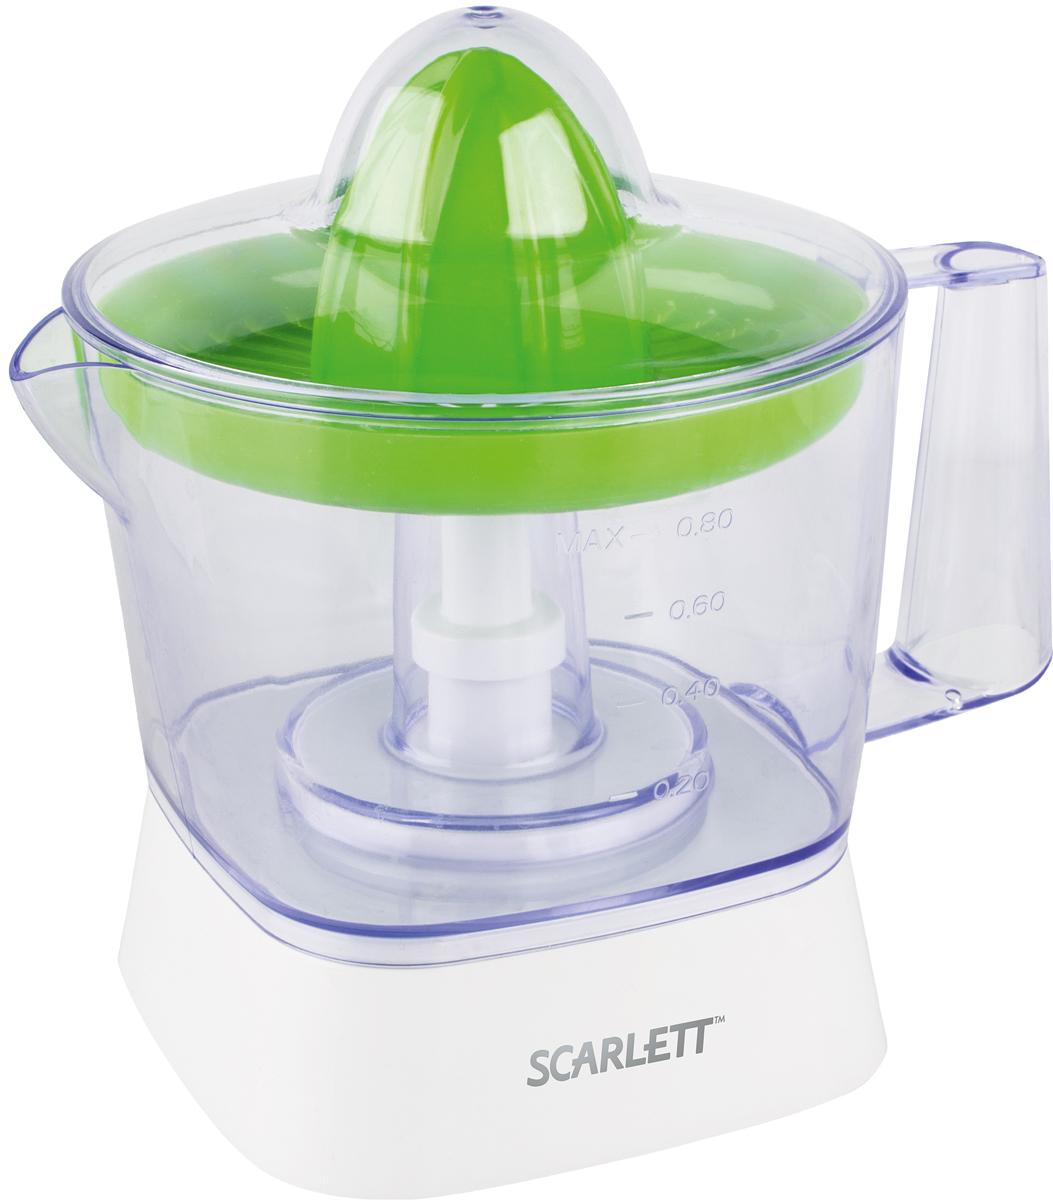 Scarlett SC-JE50C05, Green соковыжималка